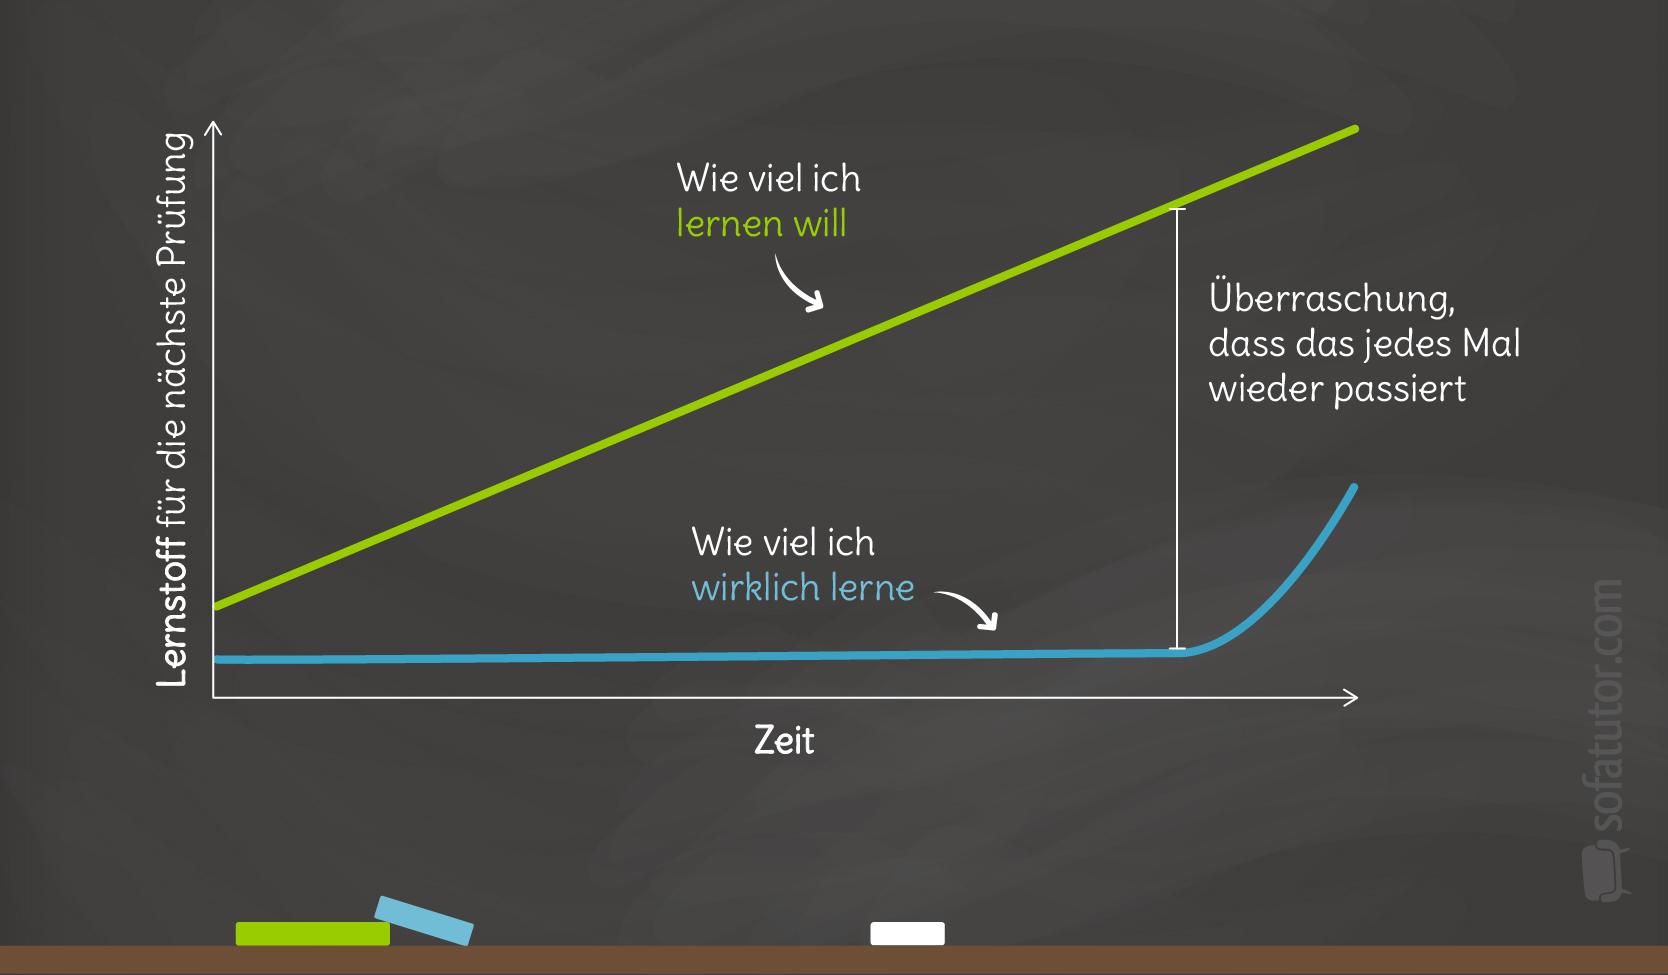 Mathe-Graphen-Alltag-Lernen